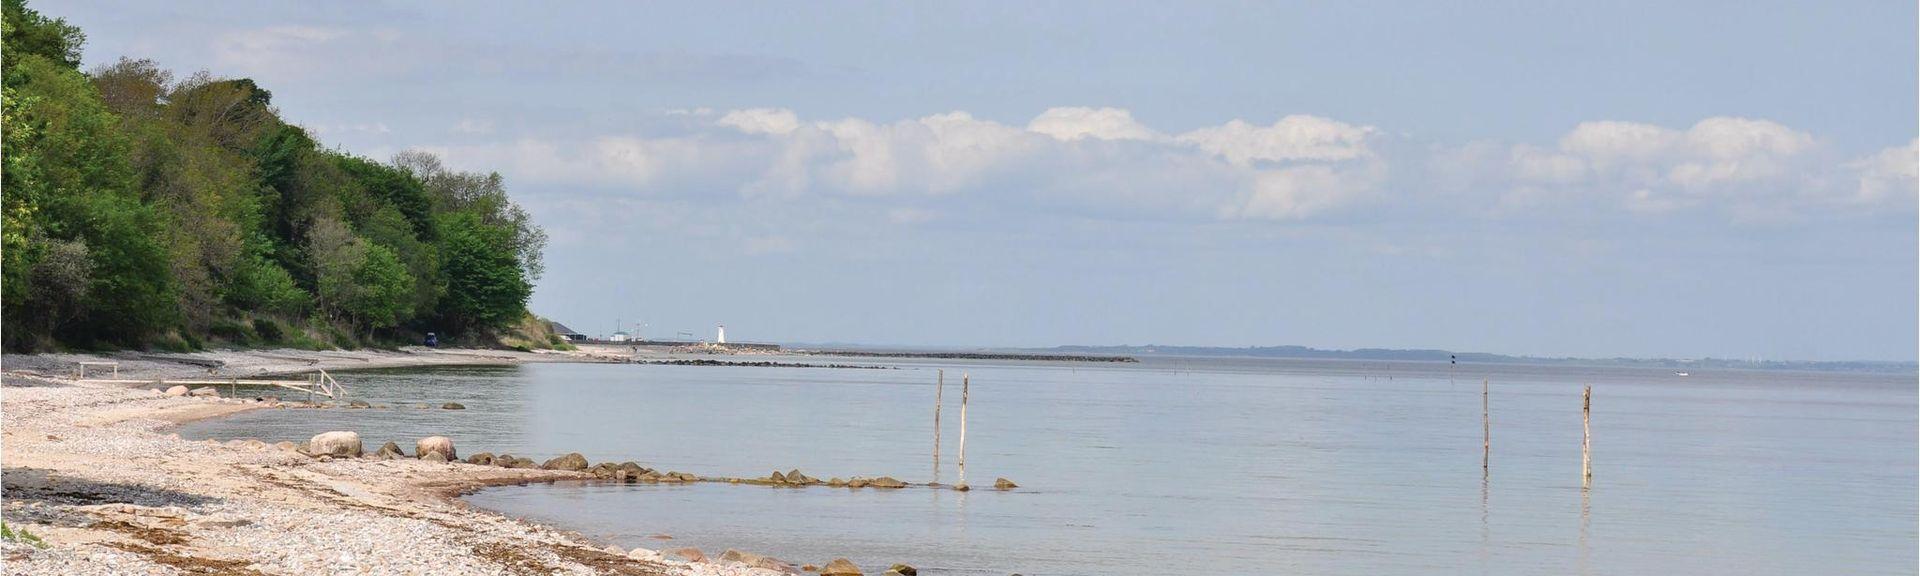 Mommark Strand, Sydals, Syddanmark, Dinamarca